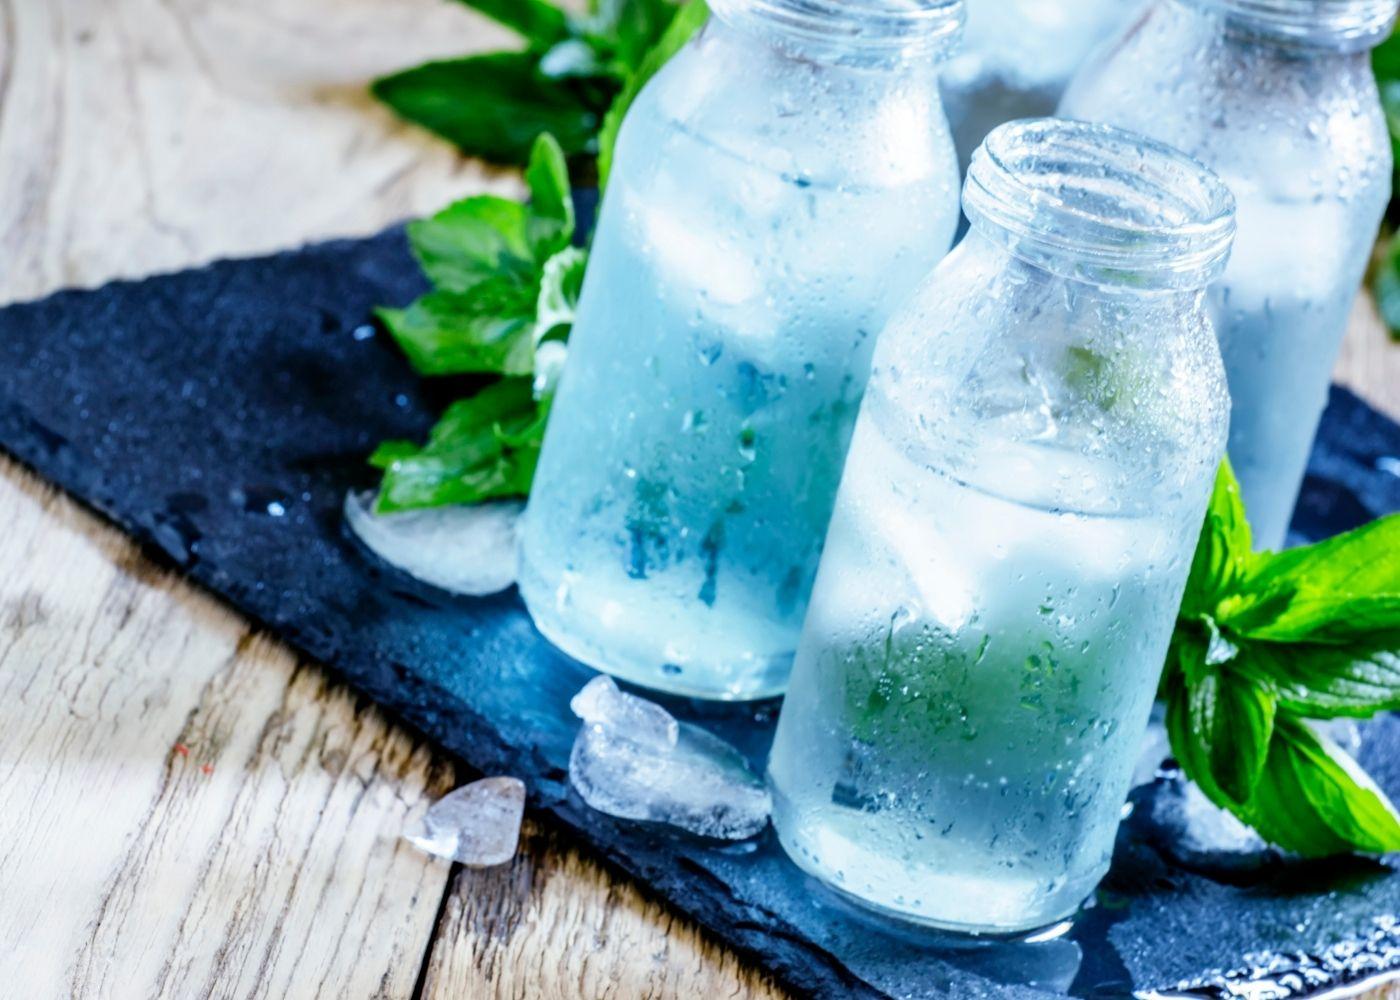 Metabolism Increasing Foods Ice Cold Water Naturopathy